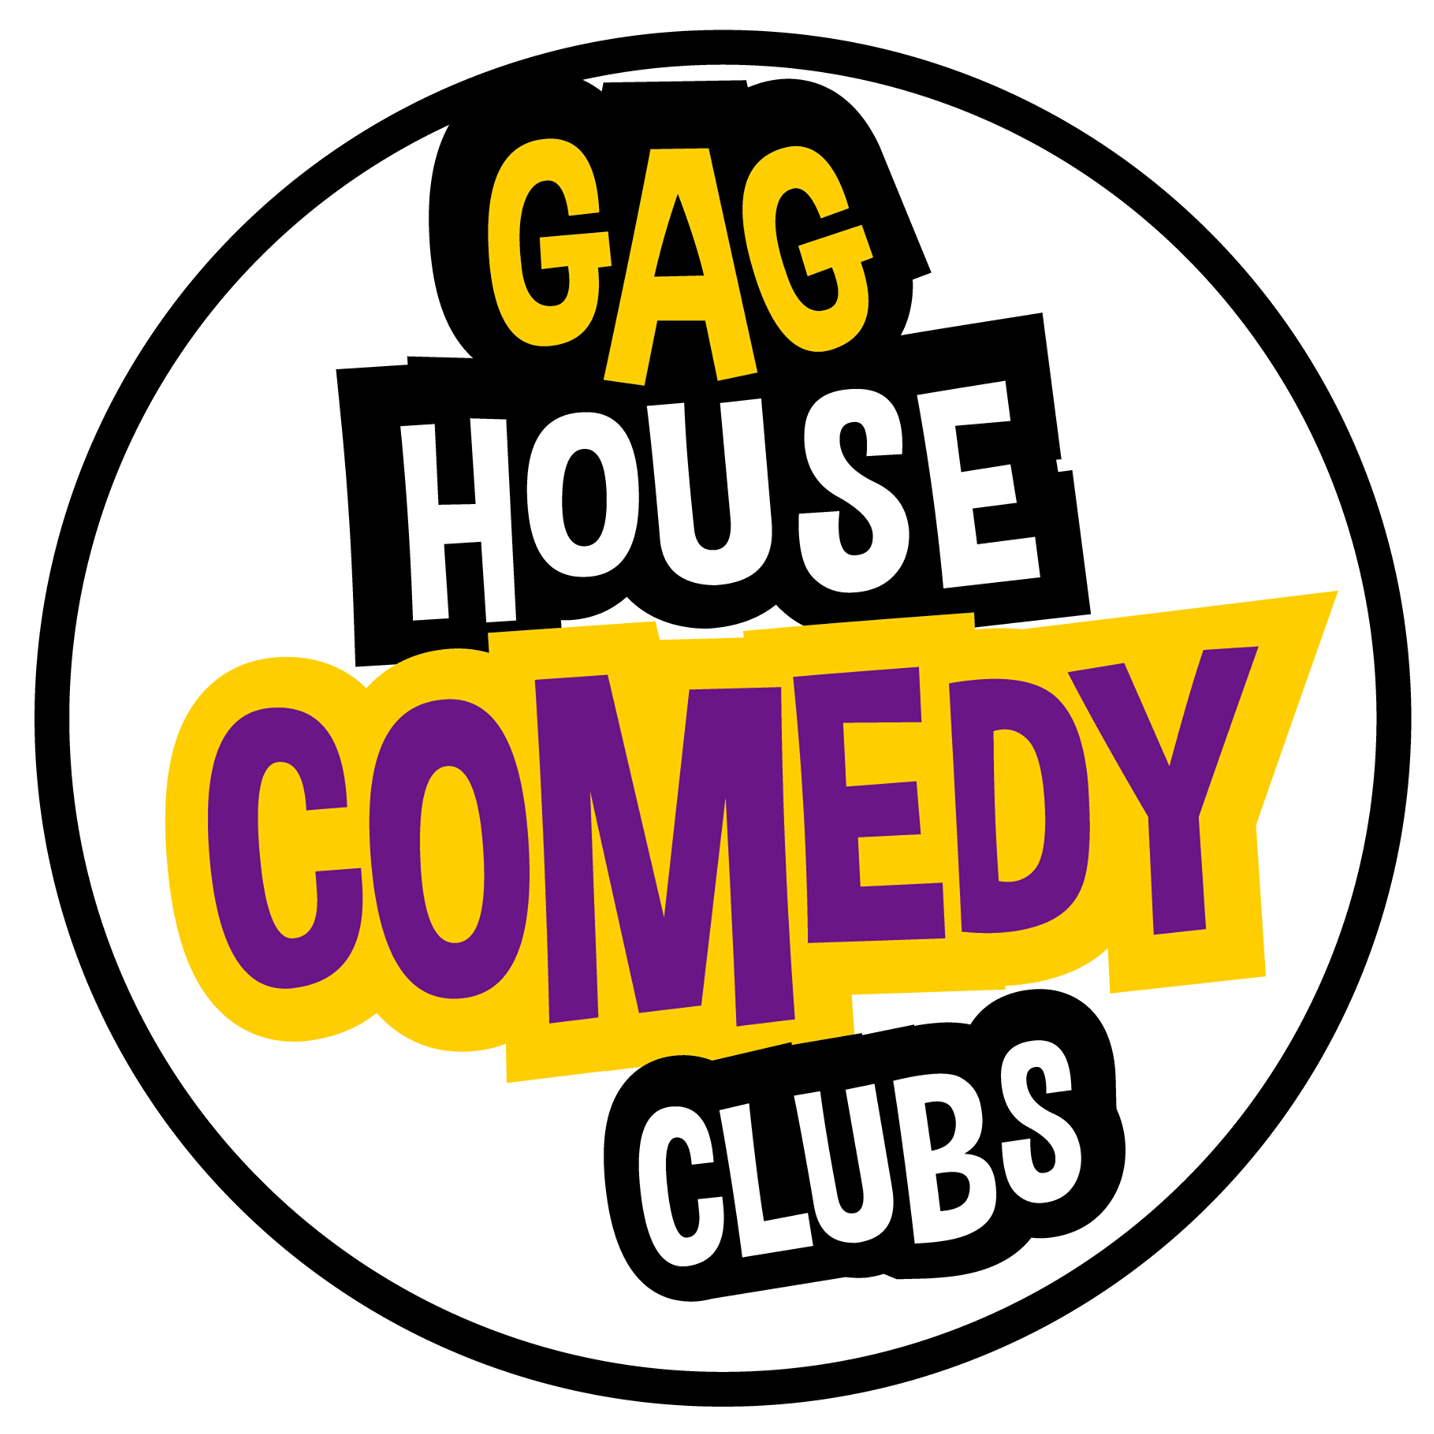 Gag house comedy club